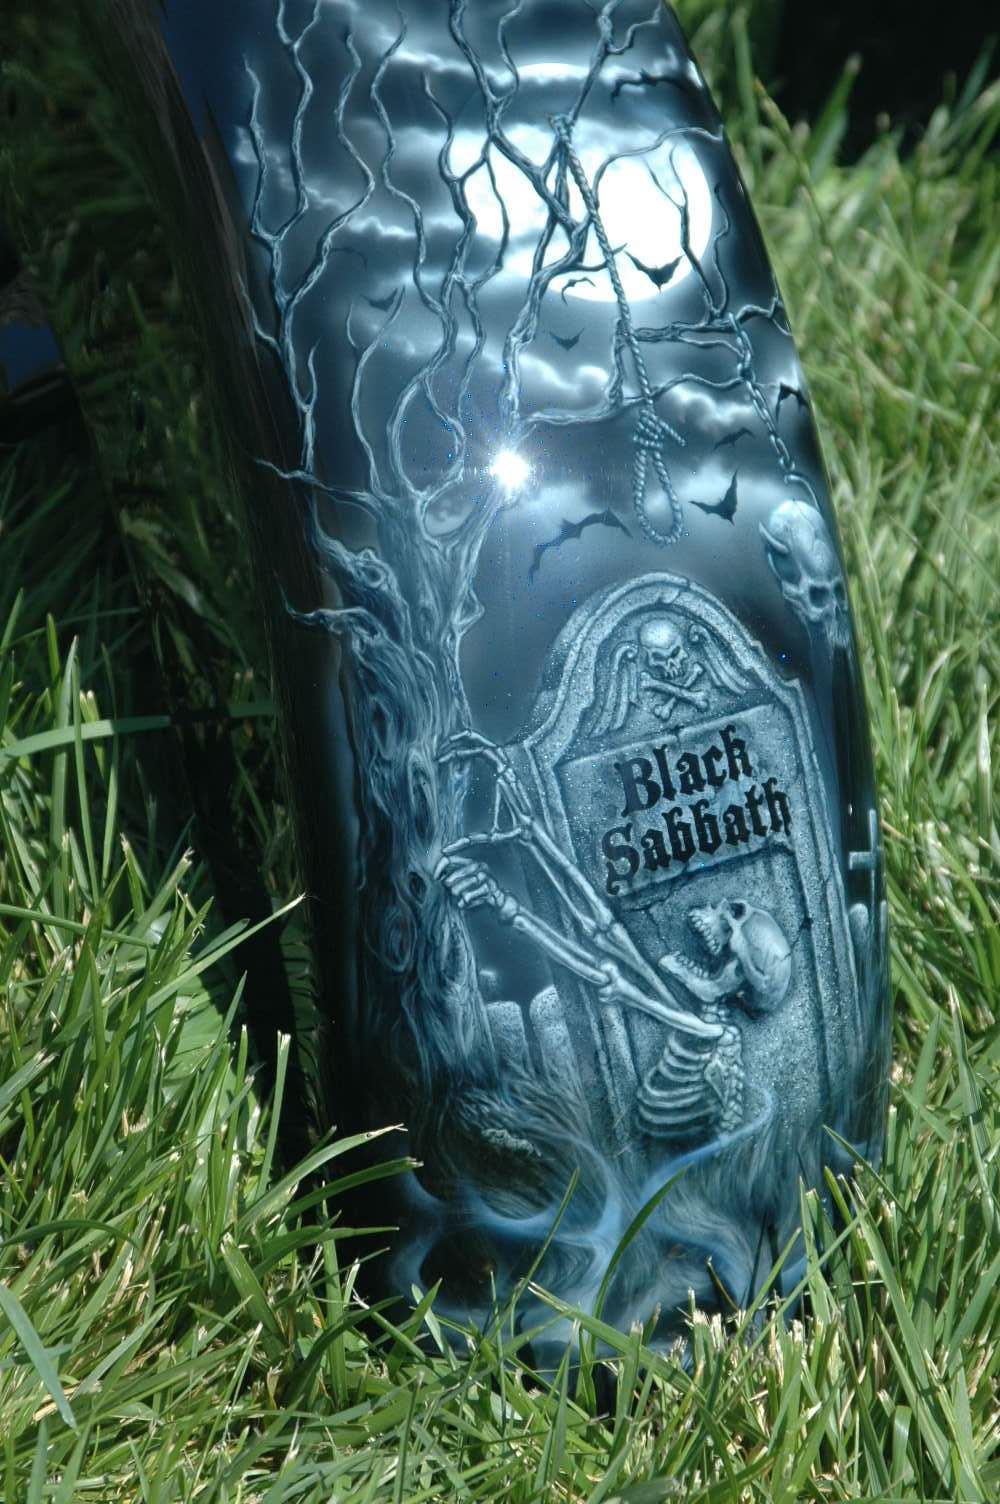 Black Sabbath Motorcycle Design Airbrush Painted By Bad